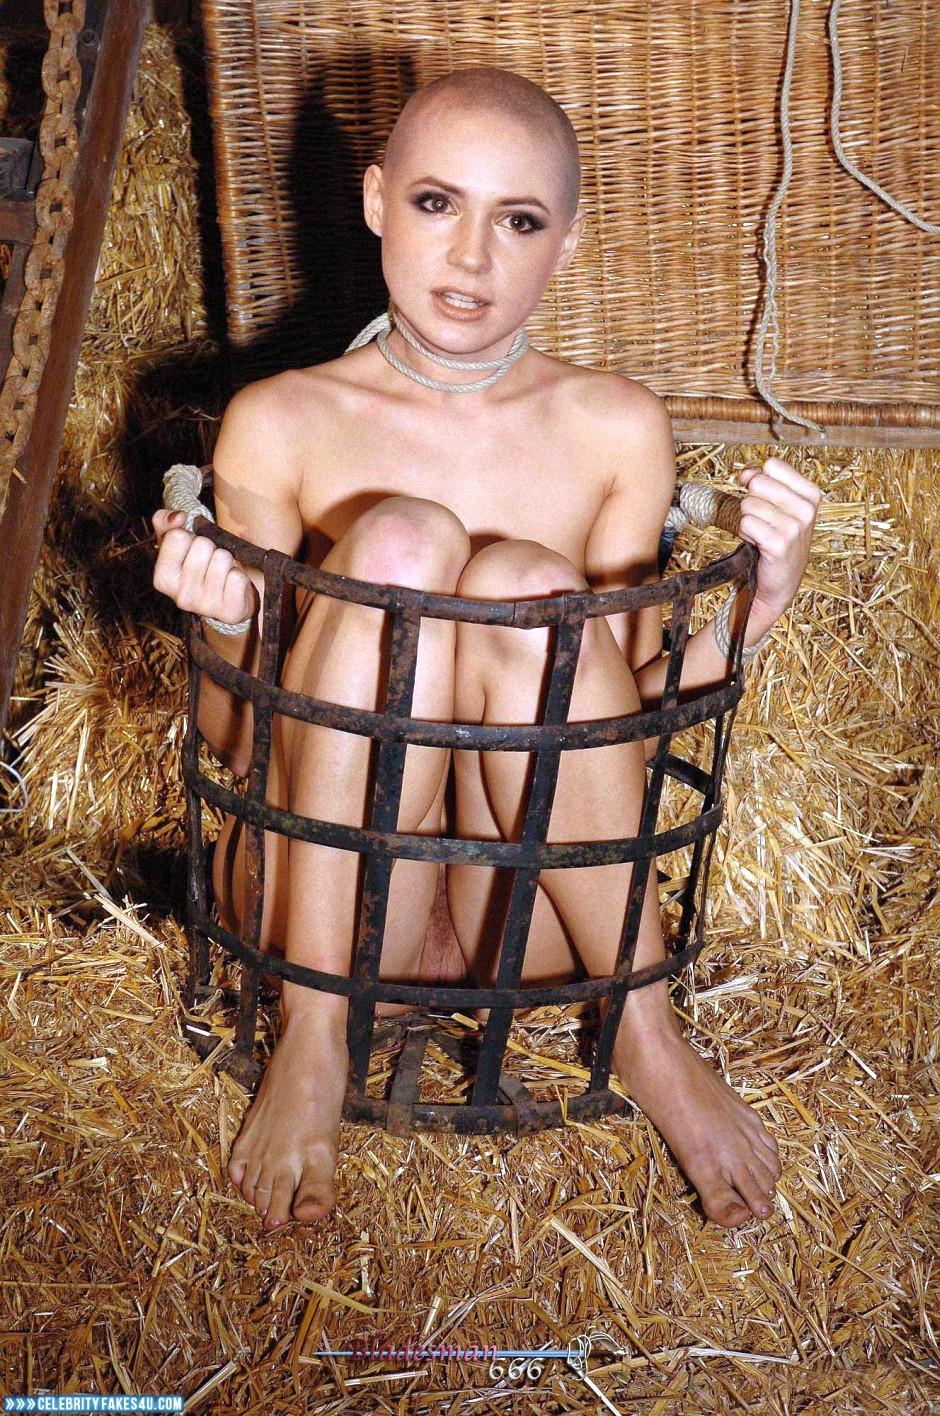 Debbie naked pic